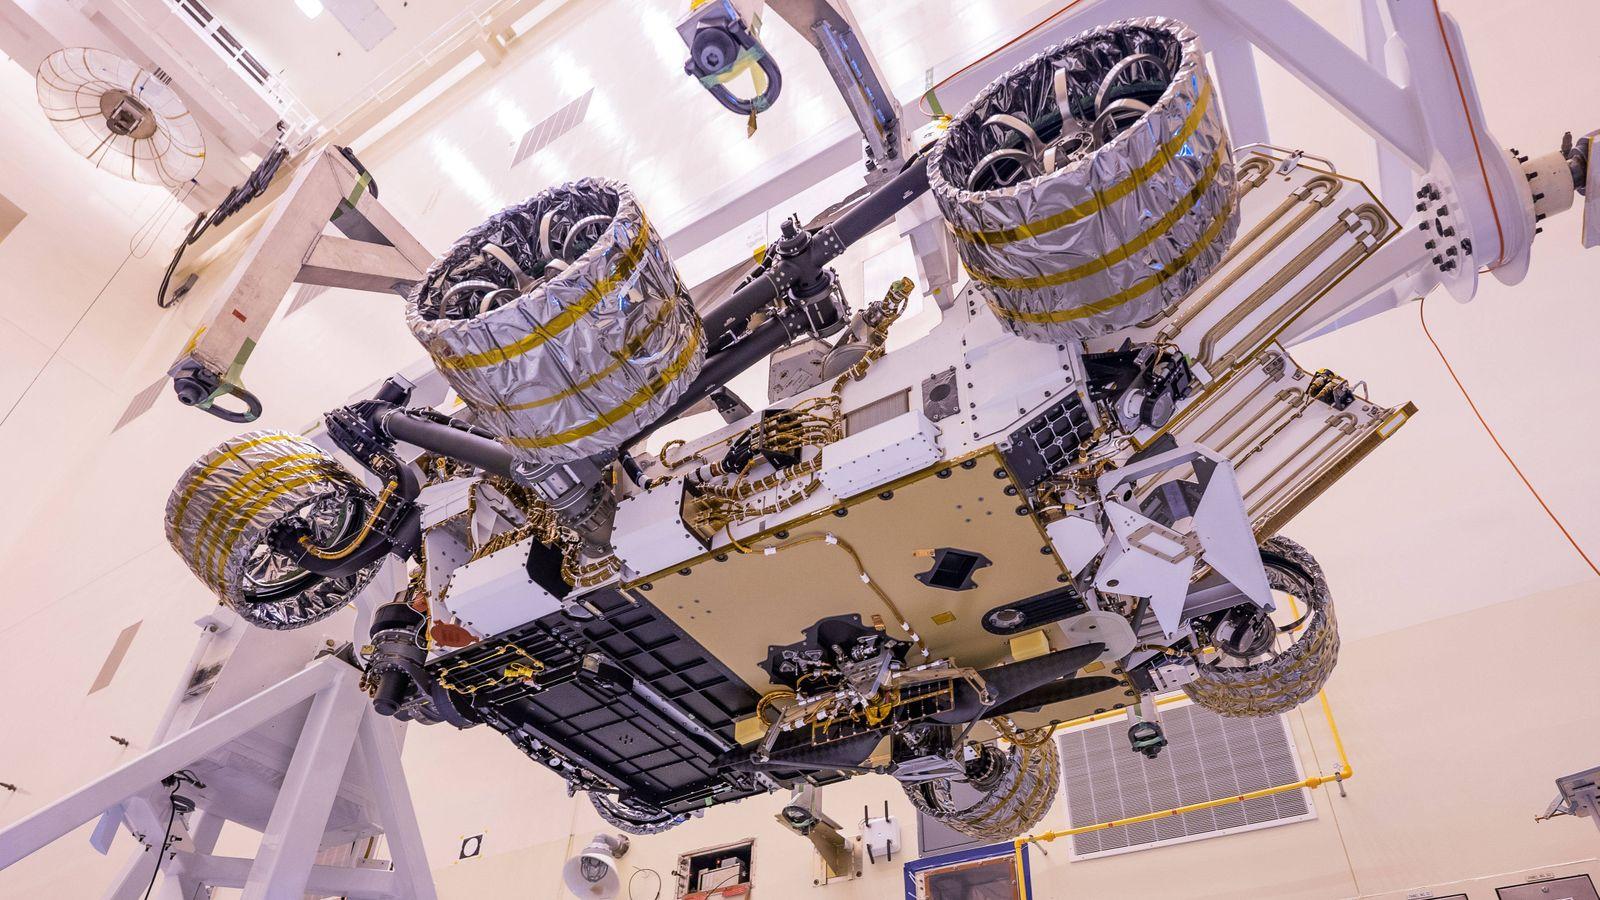 April 7, 2020, Florida, United States: NASA s Perseverance